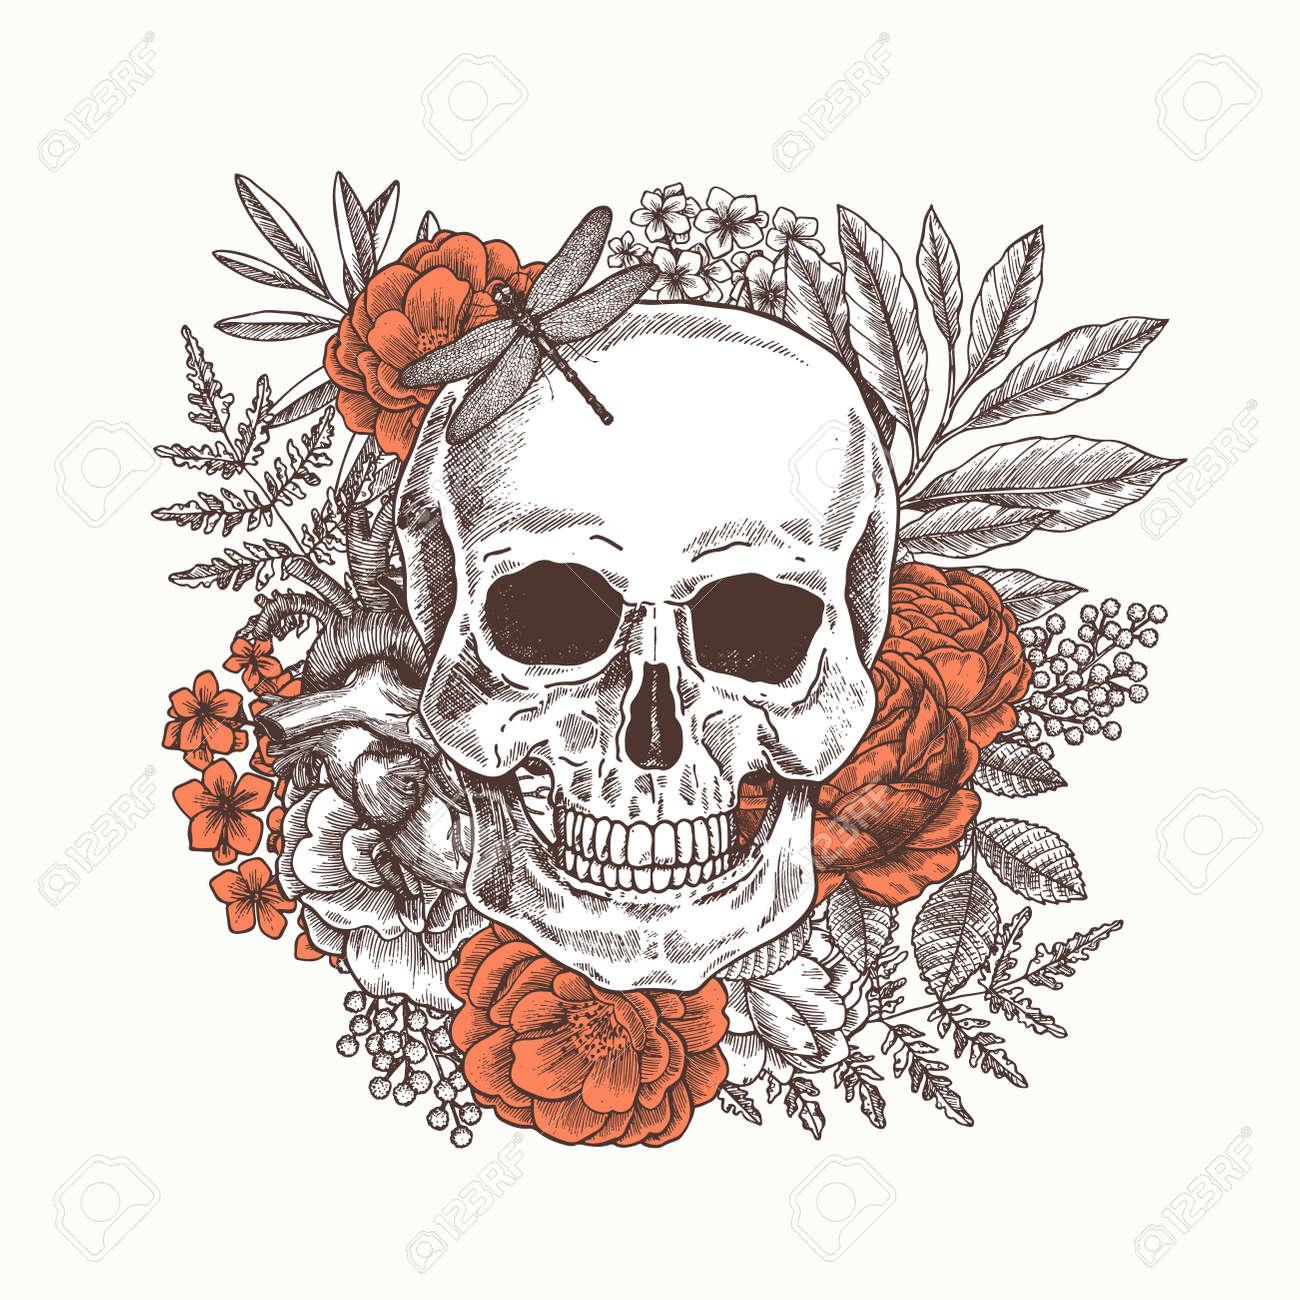 Floral Human Skull Tattoo Anatomy Vintage Illustration Royalty